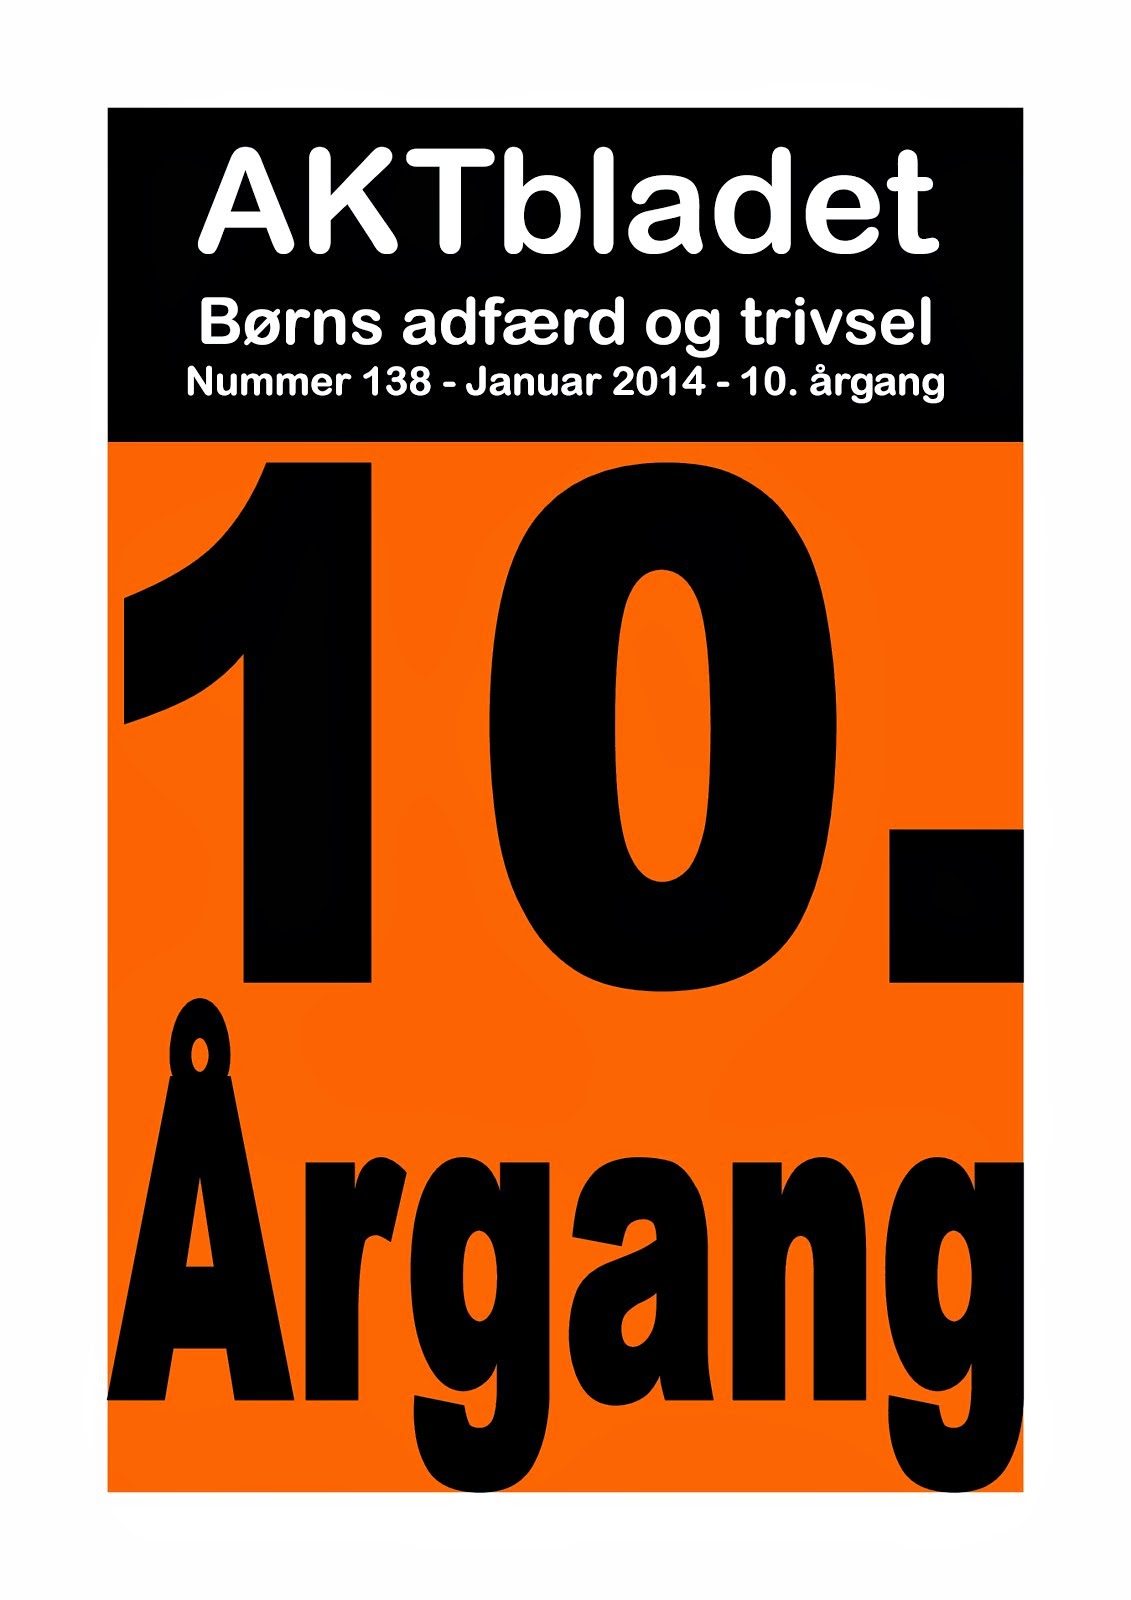 AKTblad #138